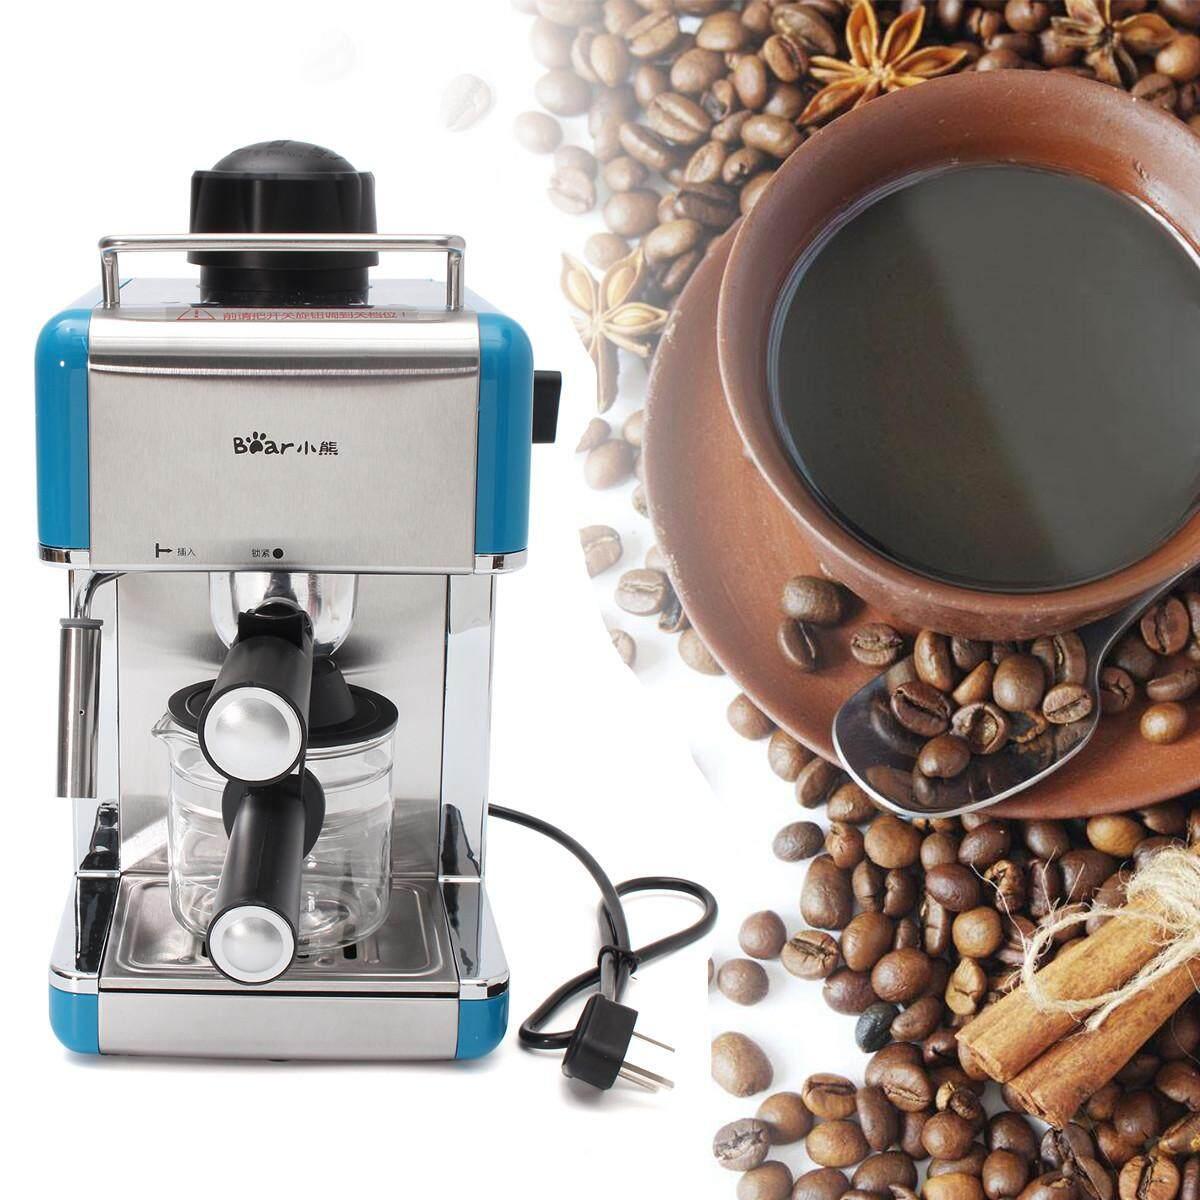 Professional Espresso Cappuccino Latte Coffee Maker Machine Stainless Steel